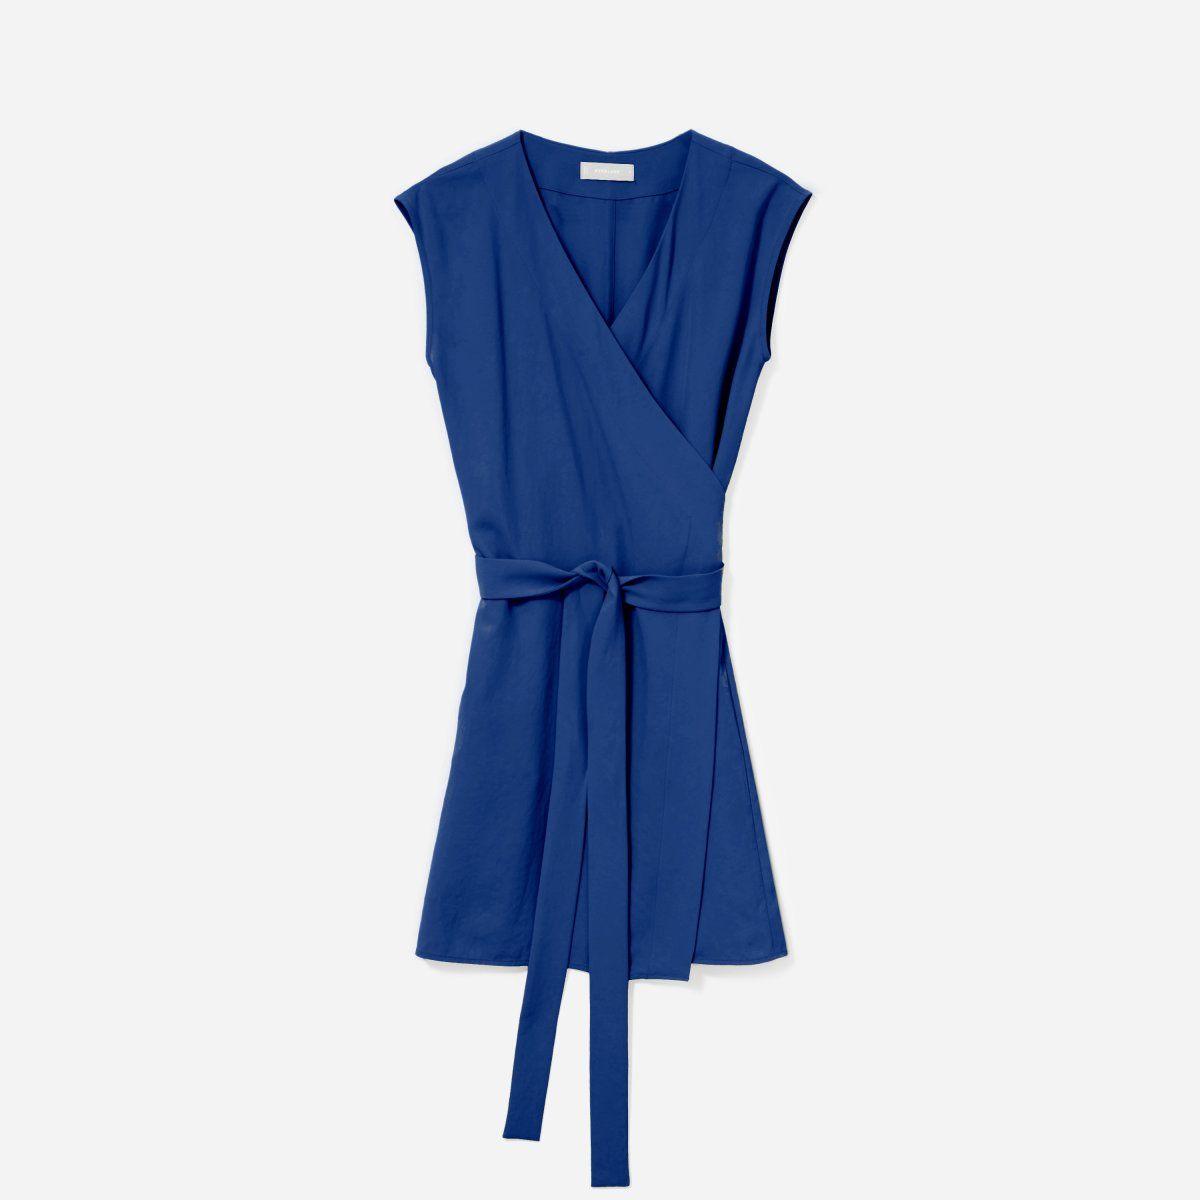 Women S Japanese Goweave Short Sleeve Mini Wrap Dress Everlane Jumpsuit Fashion Mini Wrap Dress Black Wrap Dress [ 1200 x 1200 Pixel ]